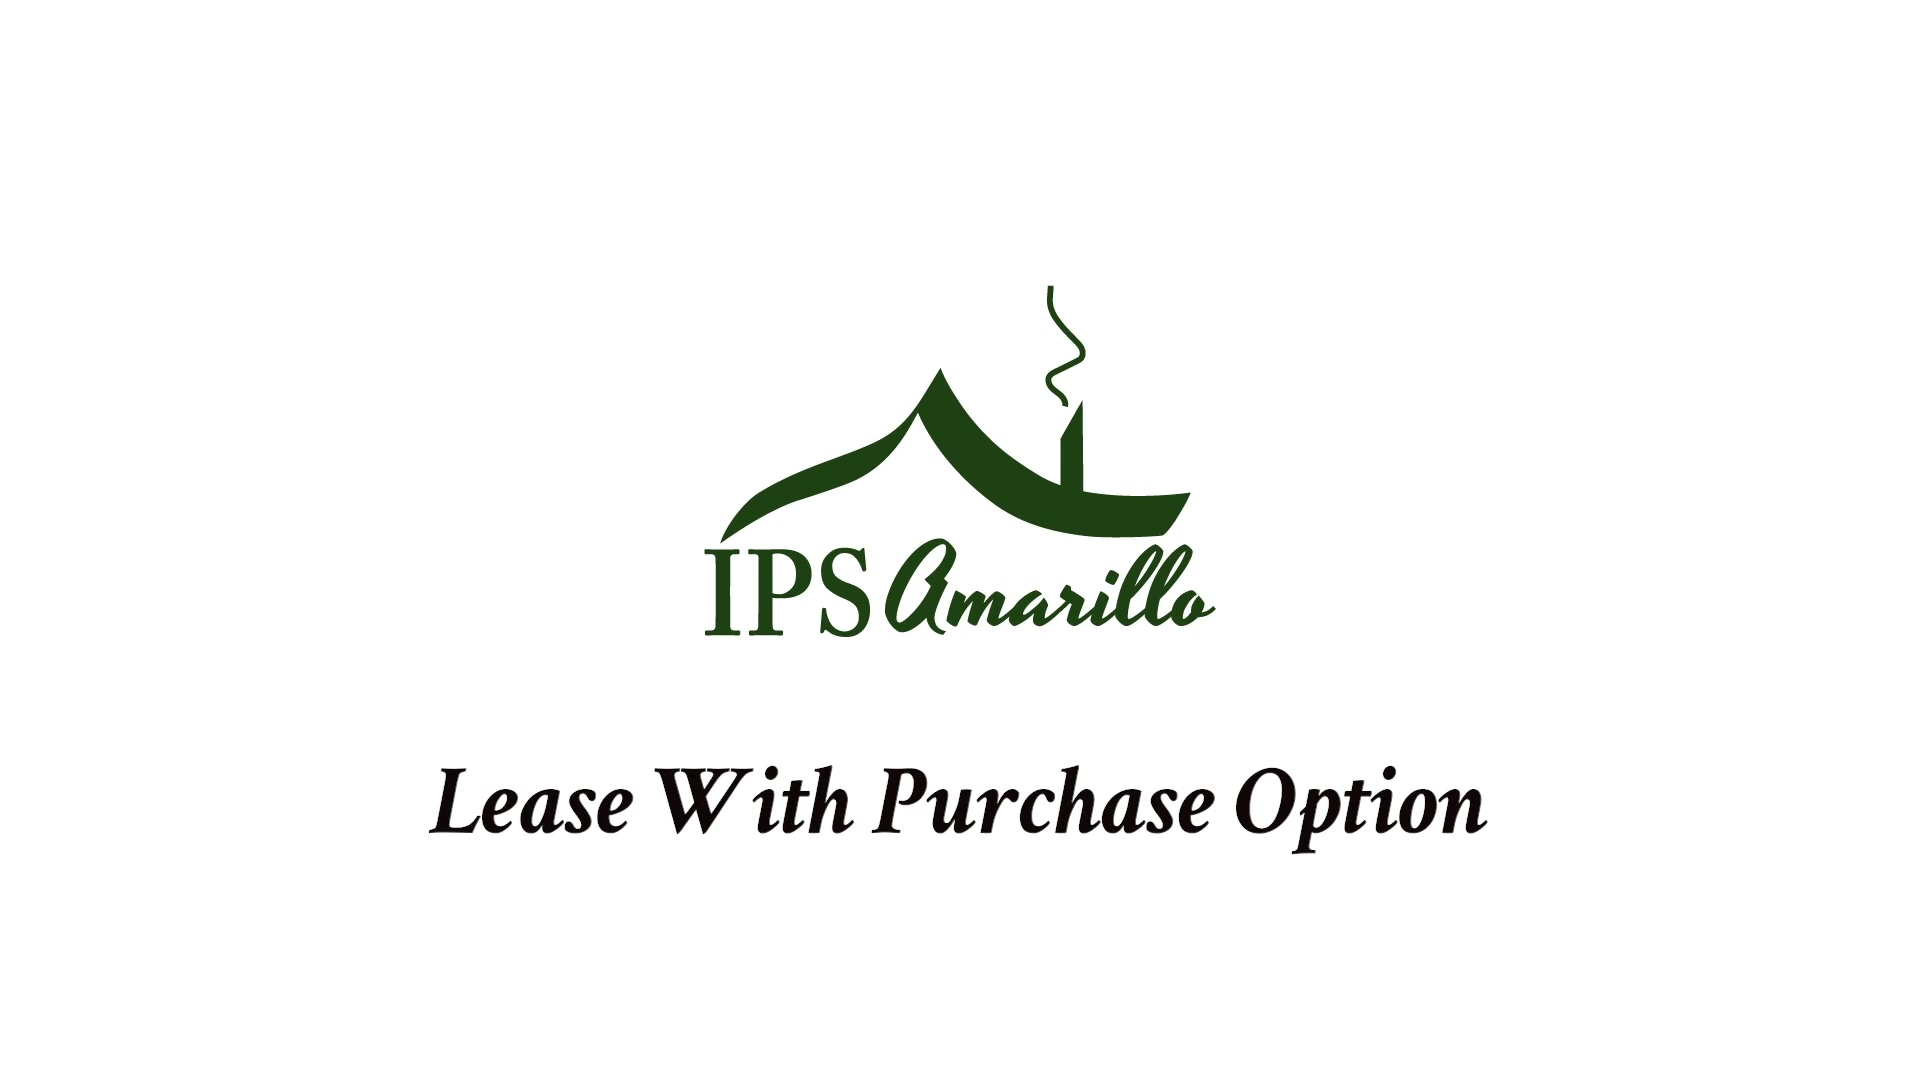 IPS Amarillo - Lease Purchase Option